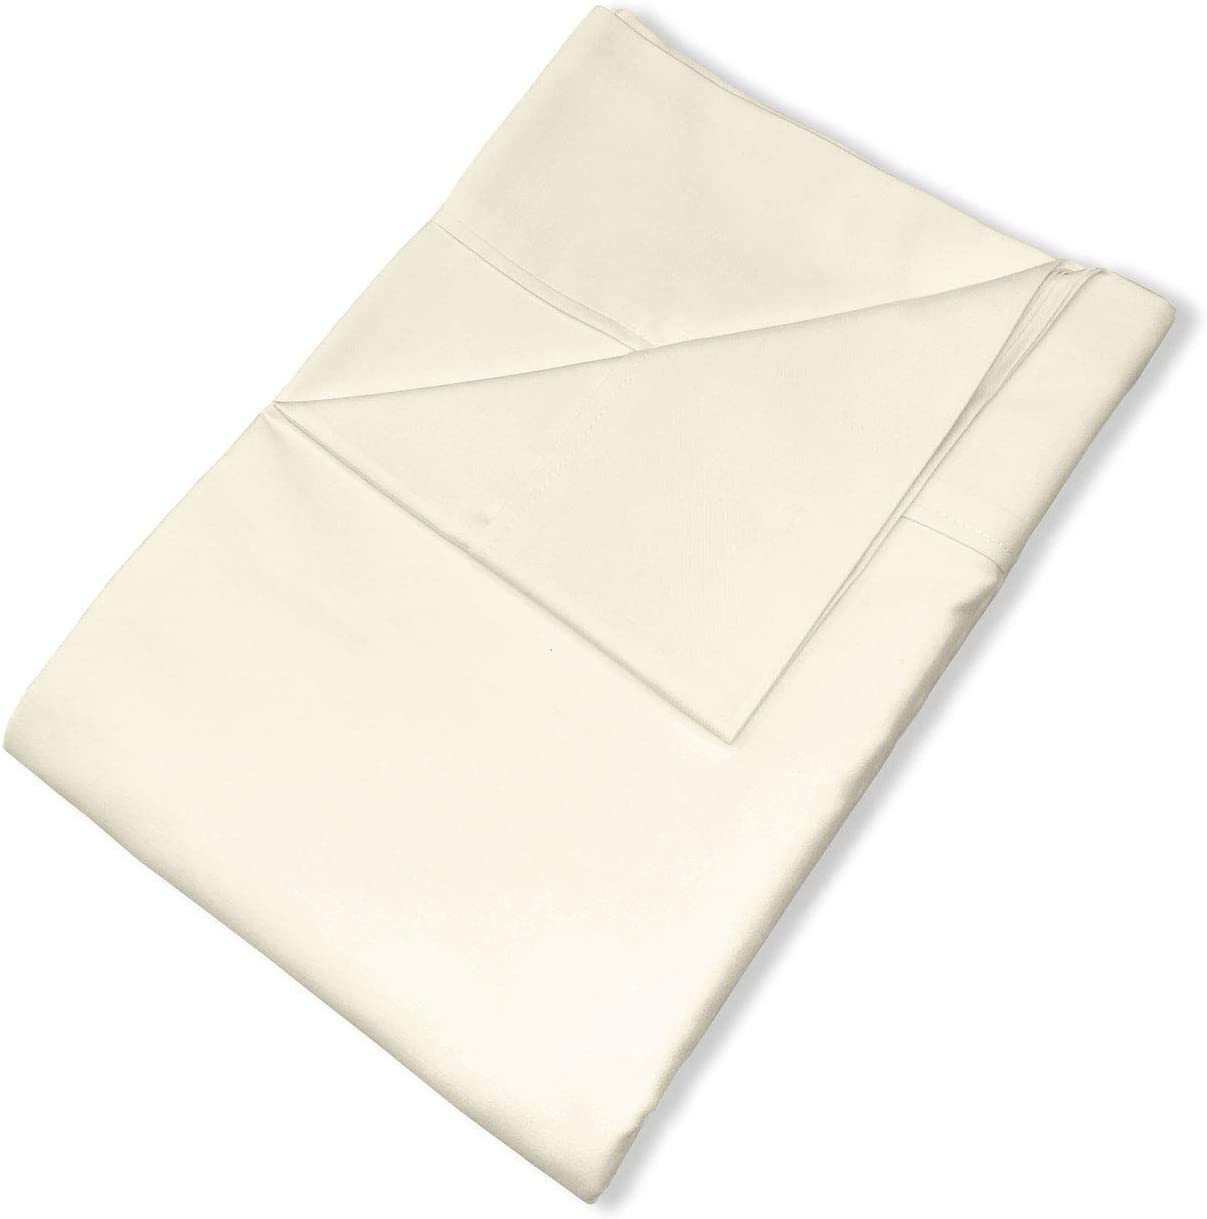 Pizuna Soft 600 Thread Count depot Cotton Flat 1pc 5 ☆ popular Sheets Ivory Full